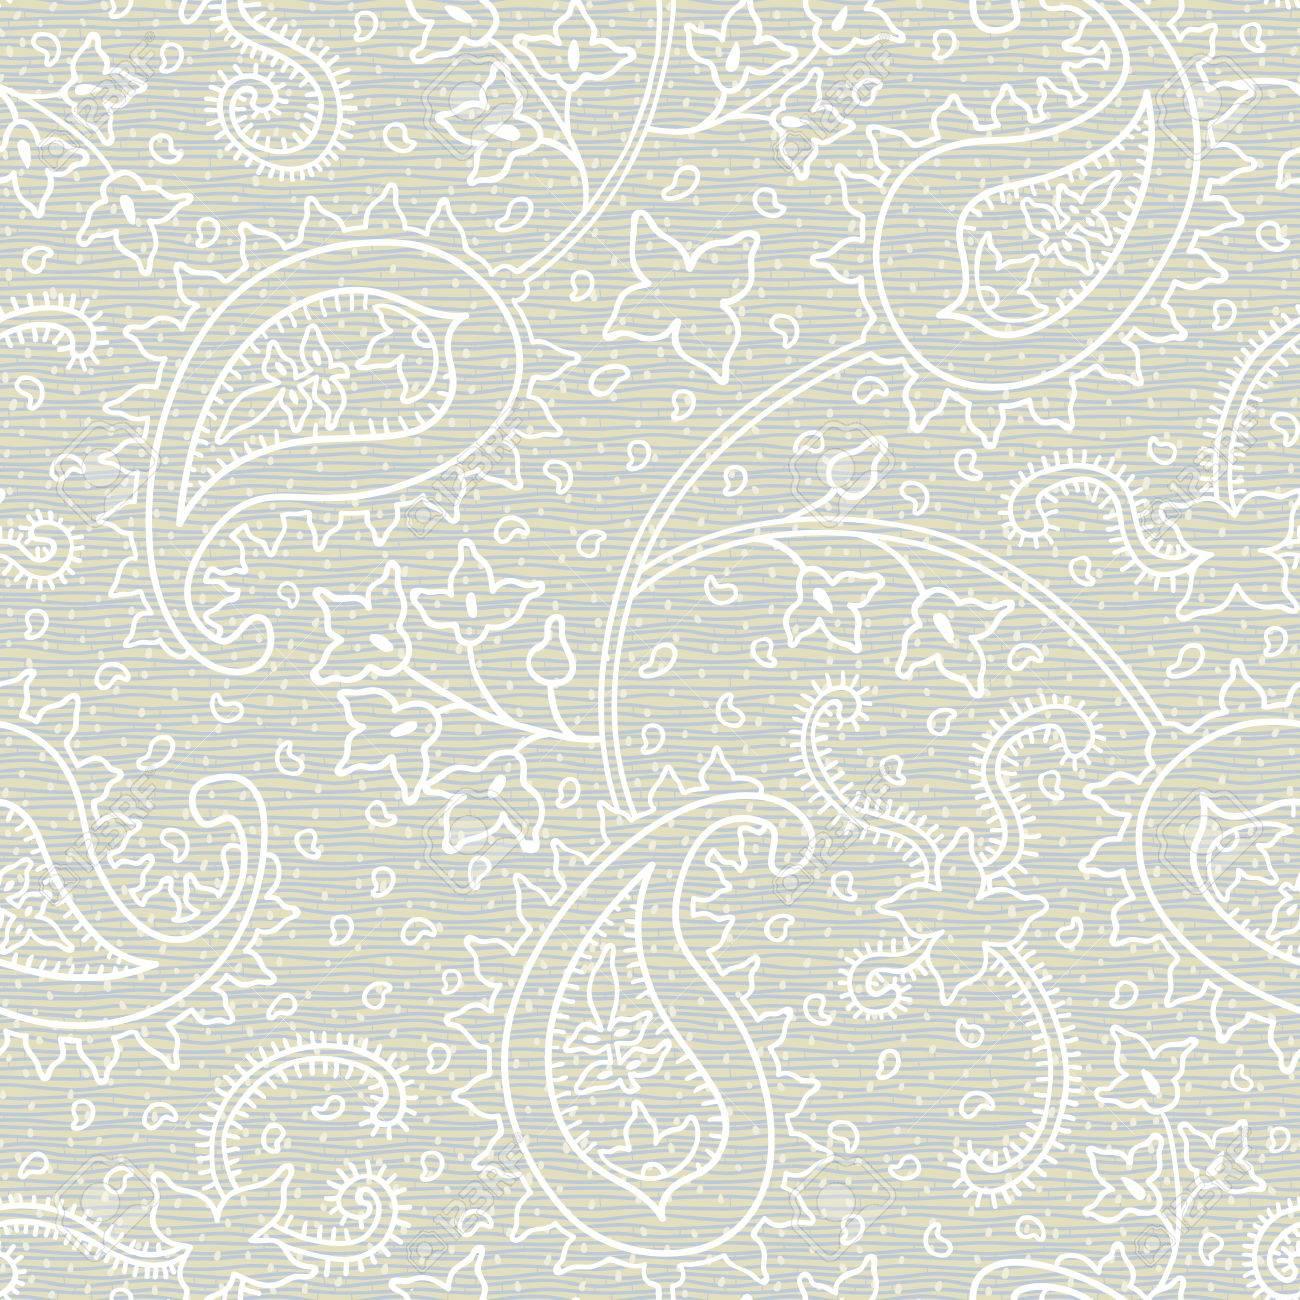 Adornado Textura Floral Transparente. Patrón Sin Fin Grey. Fondo De ...